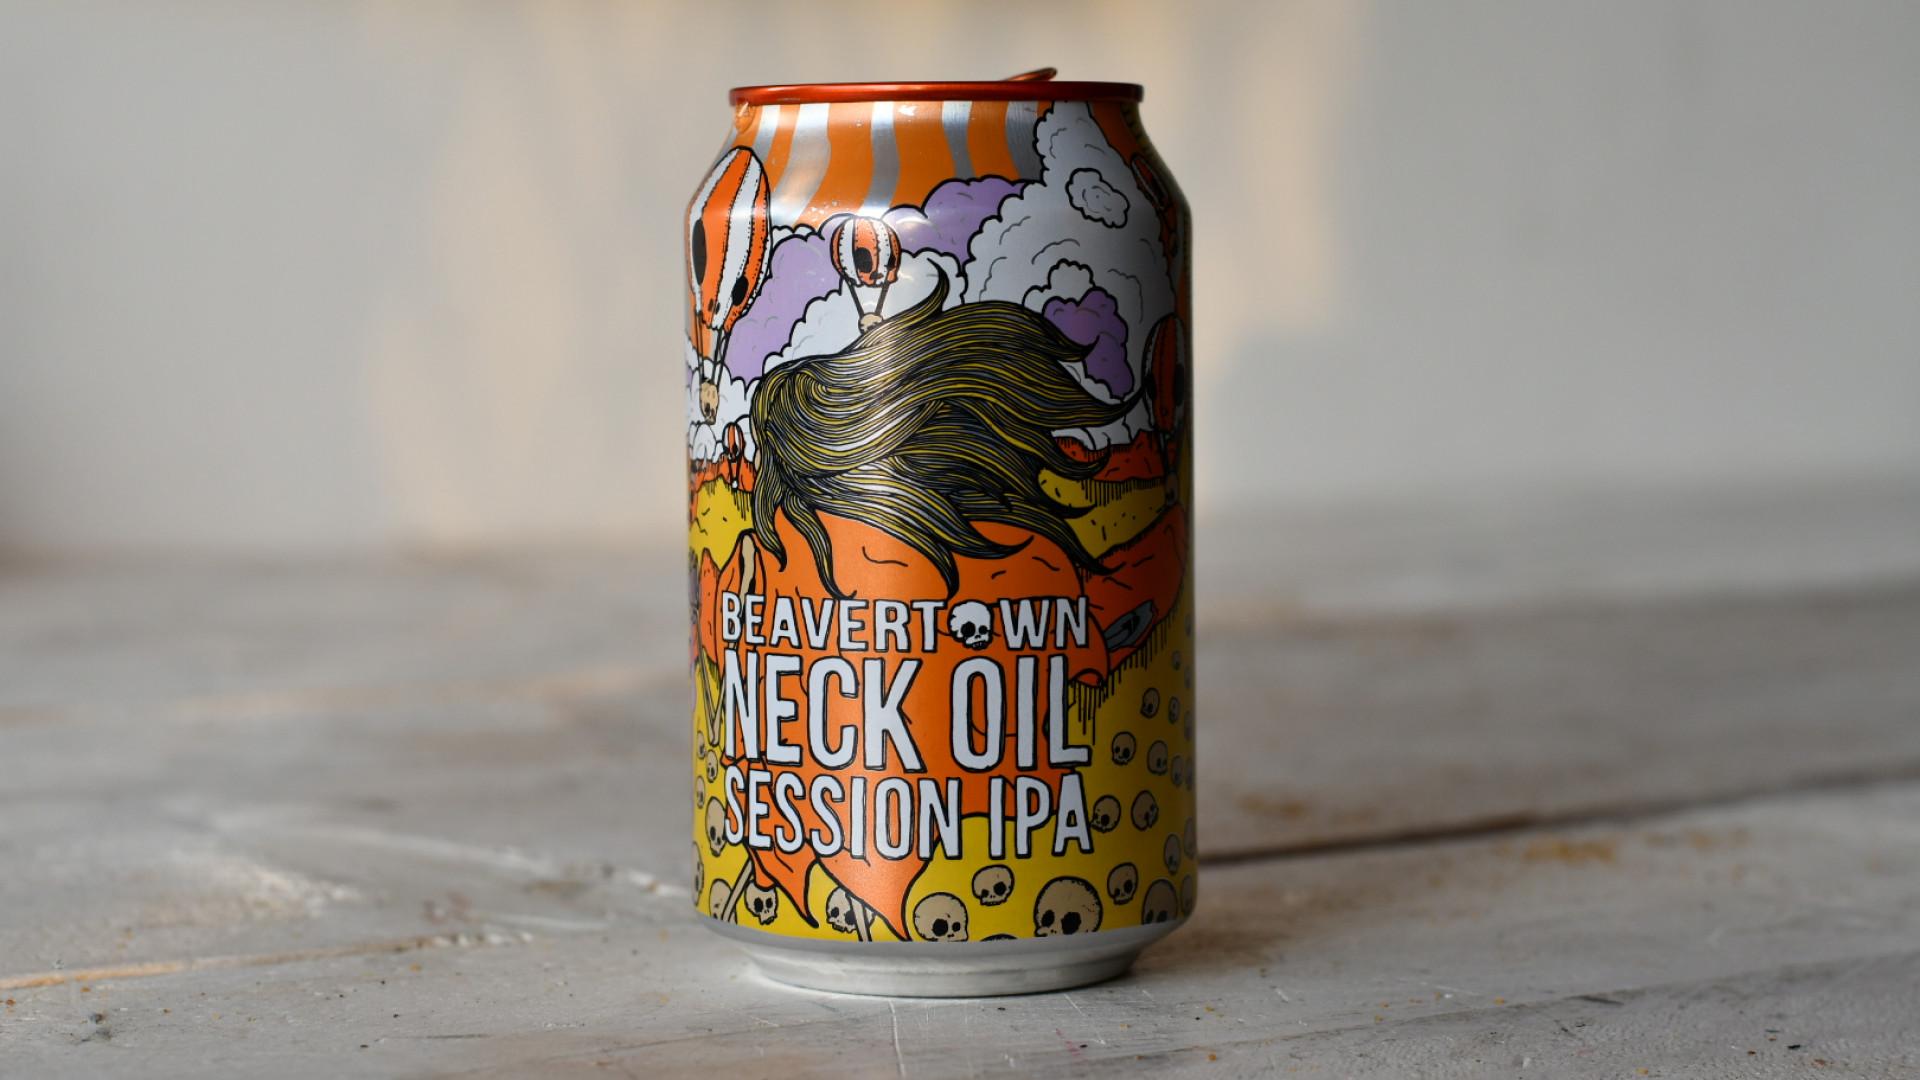 Beavertown Neck Oil session IPA